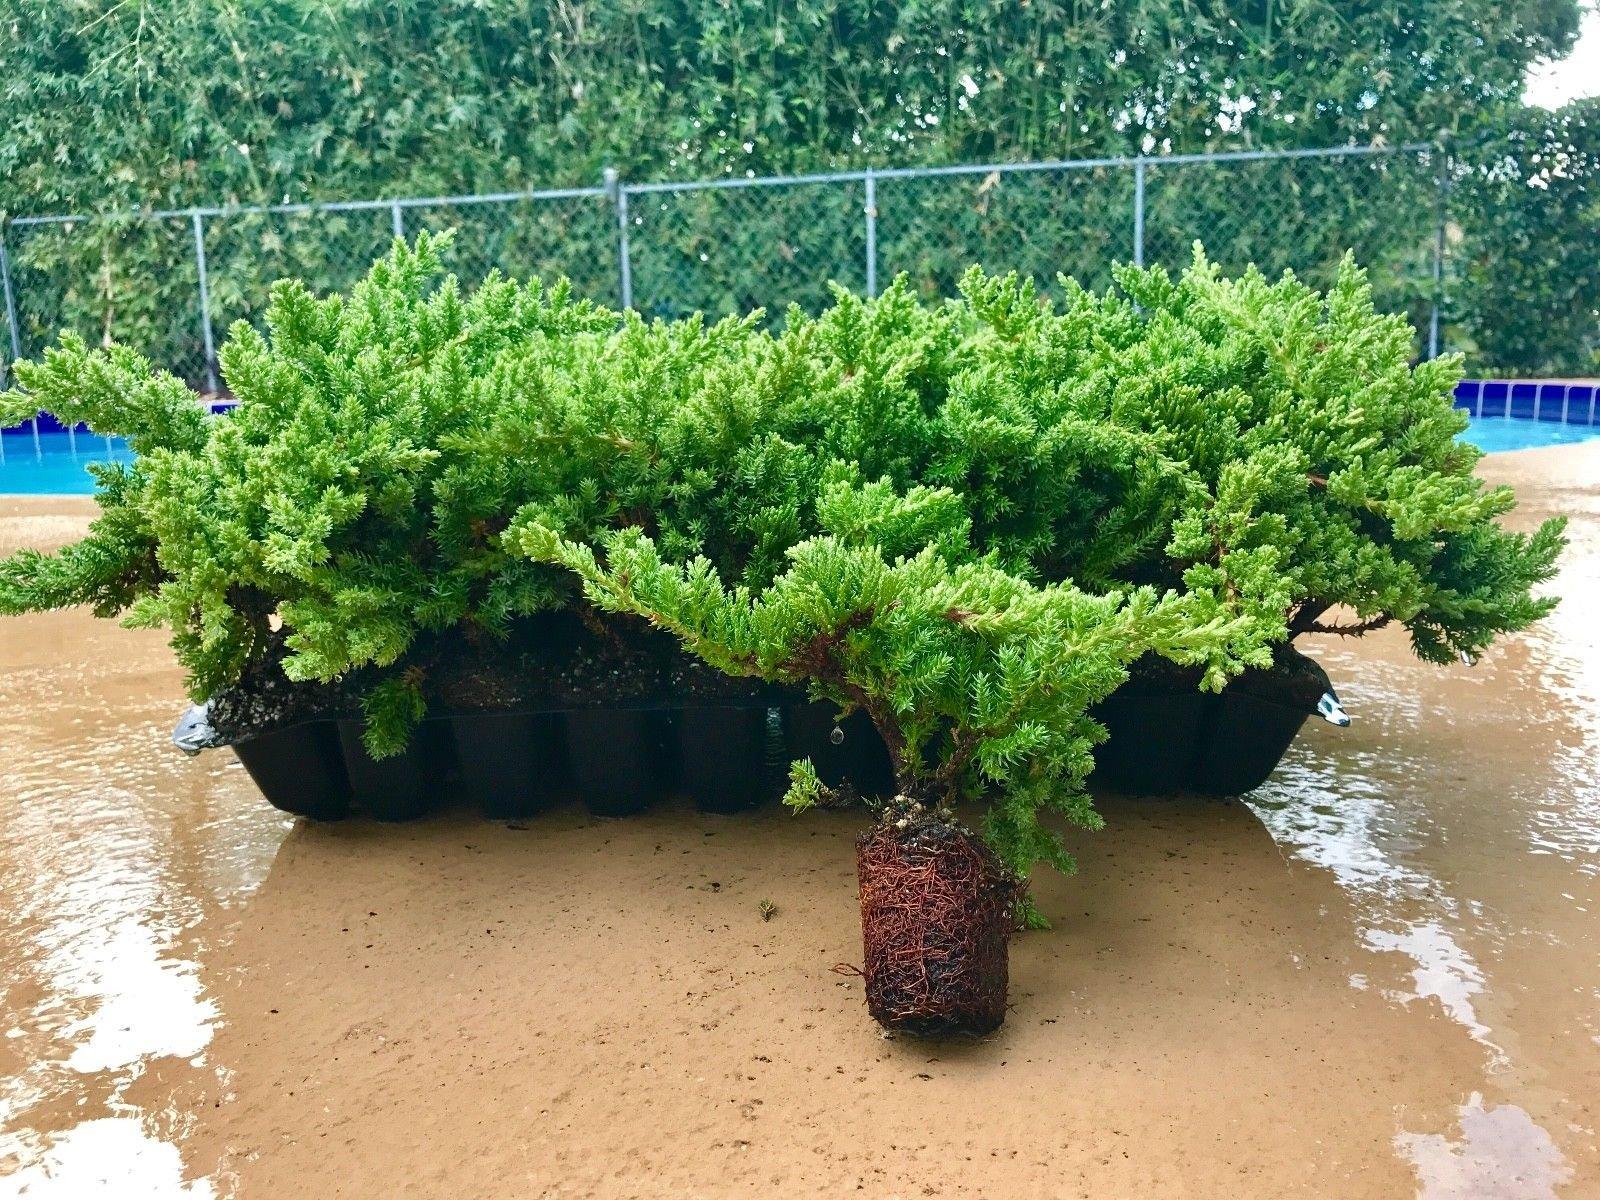 Juniper Procumbens Nana Qty 60 Live Plants Groundcover by Florida Foliage (Image #1)